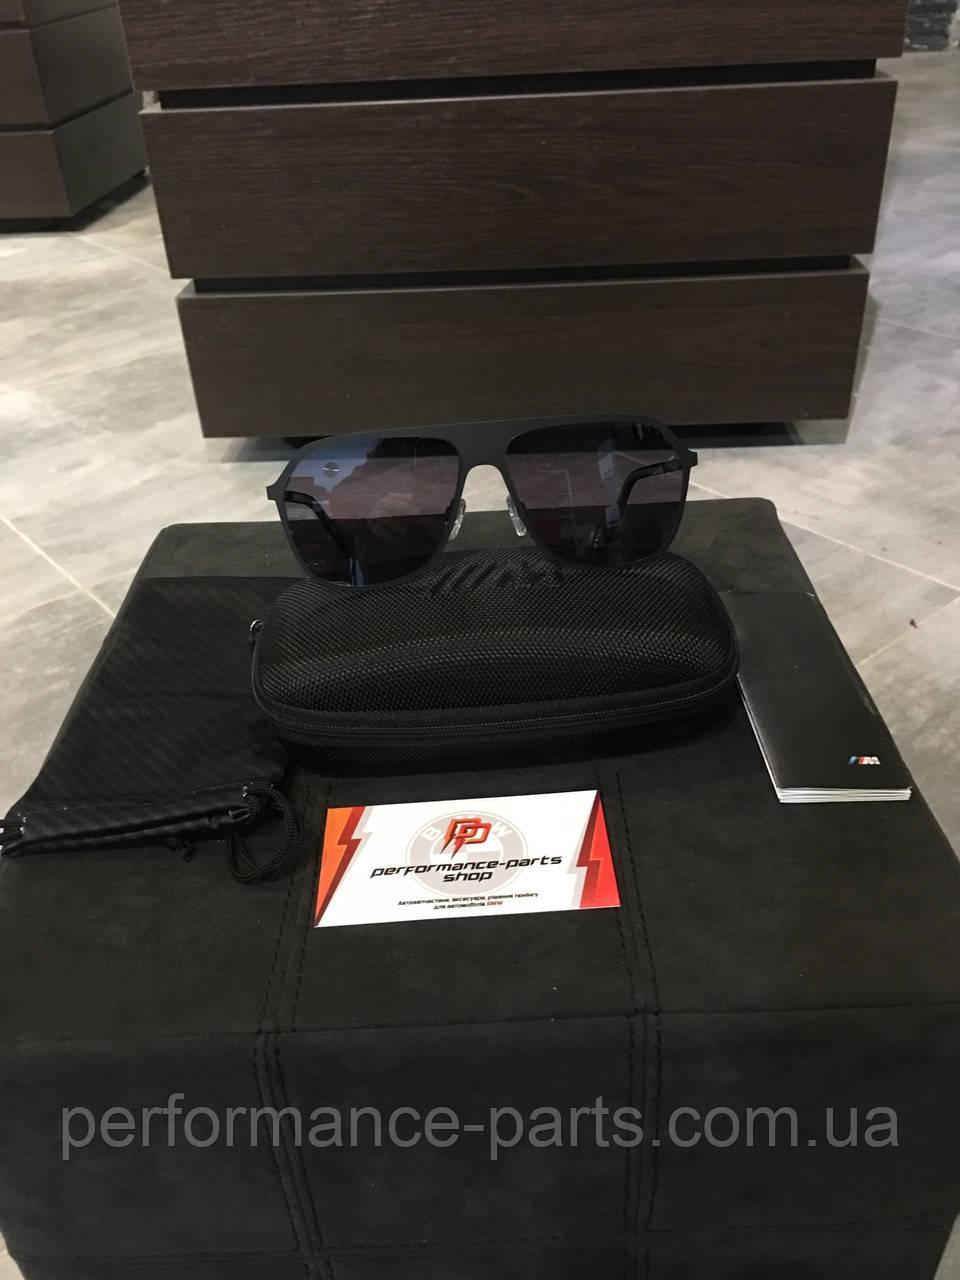 Солнцезащитные очки BMW M Sunglasses, Unisex. 80252454758. Оригинал.